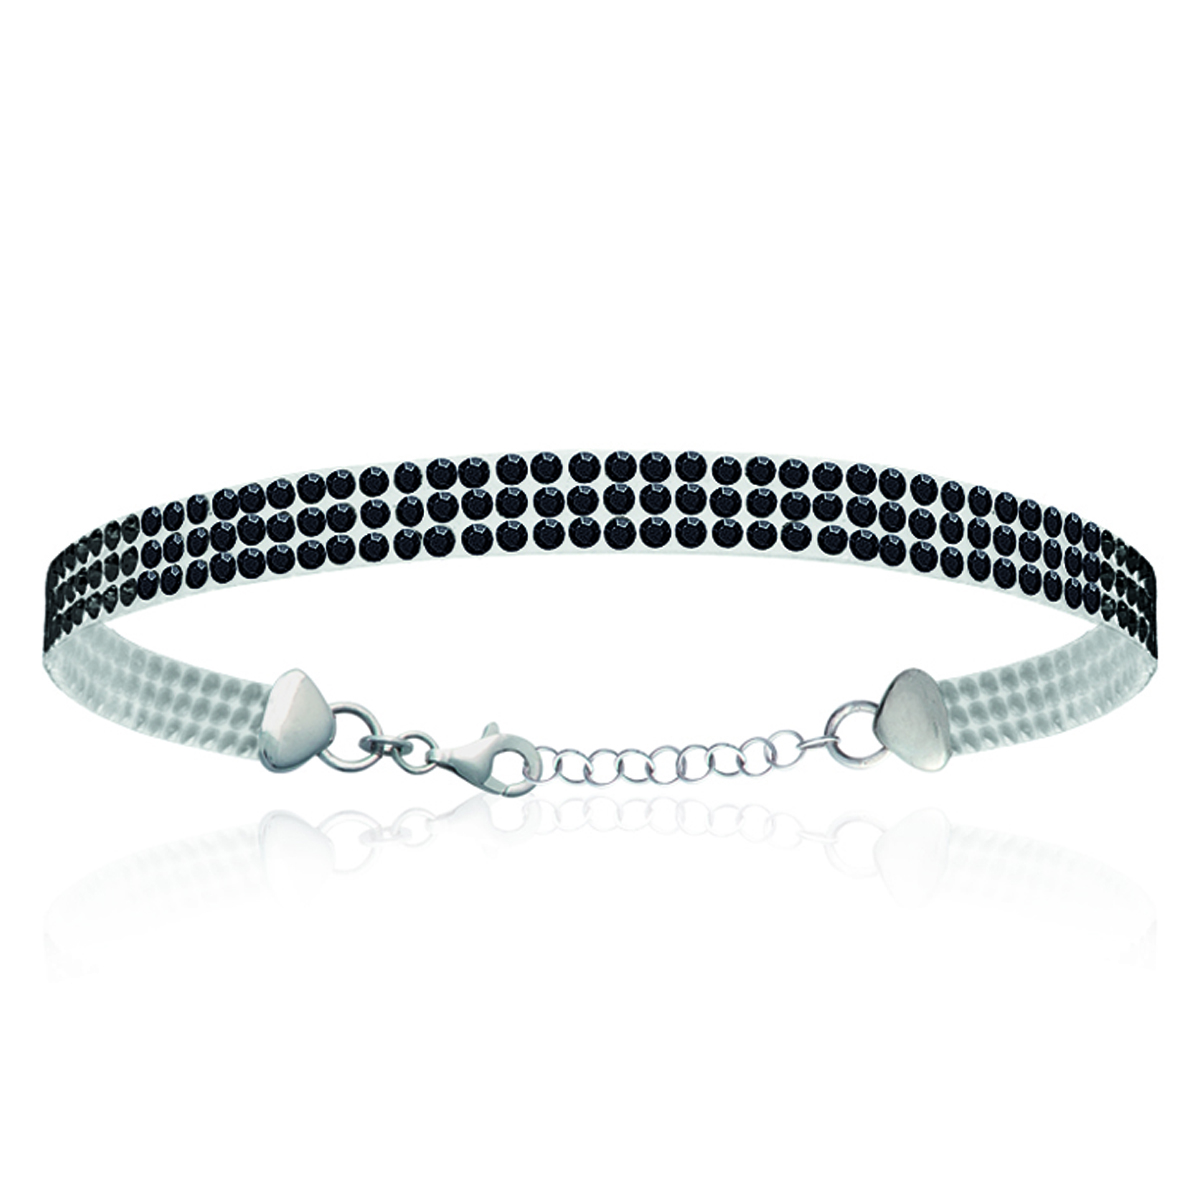 Bracelet Argent \'Sissi\' noir (cristal) - 5 mm - [L0713]